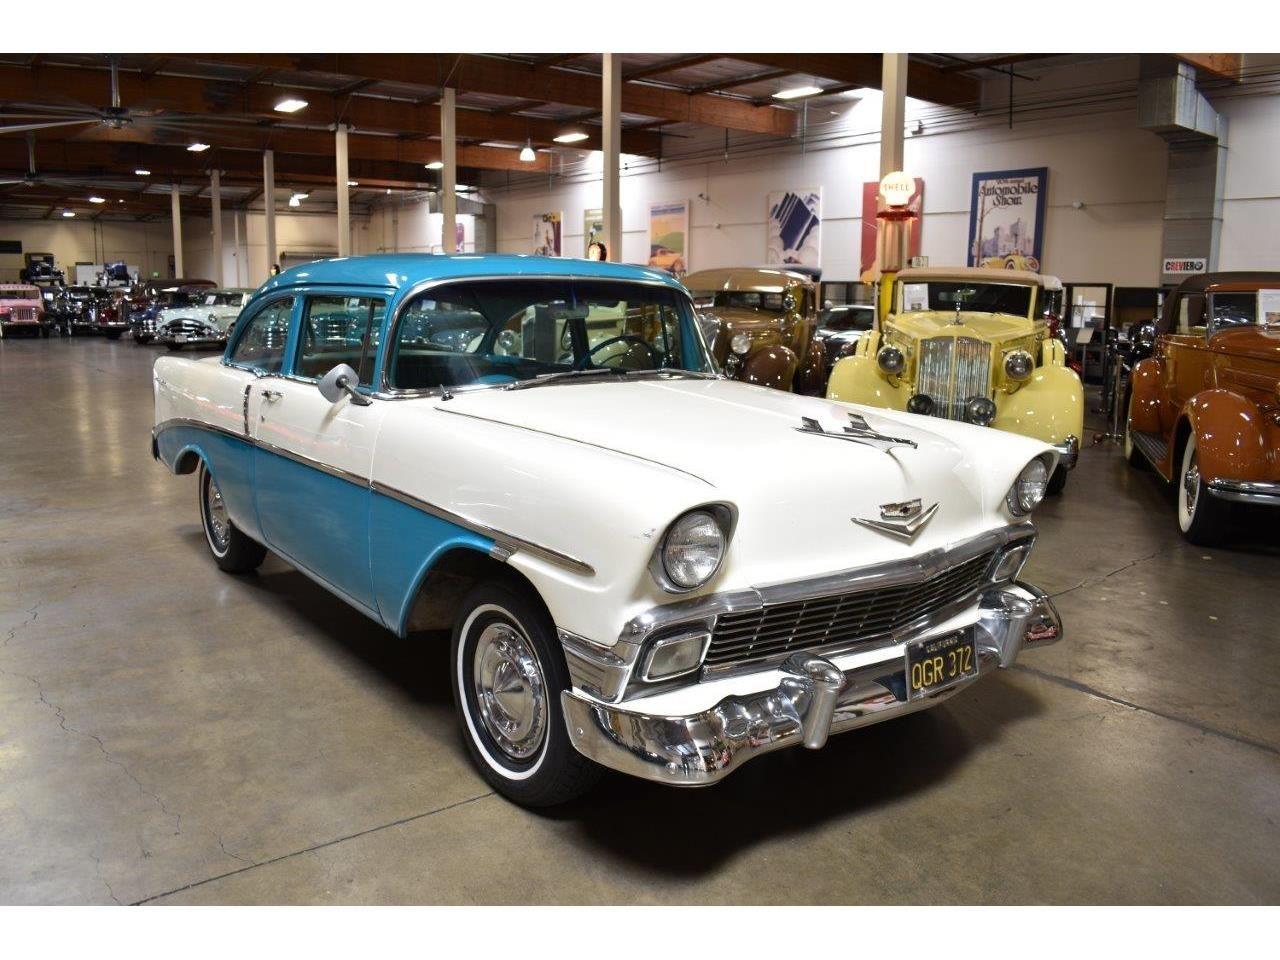 1956 Chevrolet Bel Air 2Door Sedan Chevrolet bel air